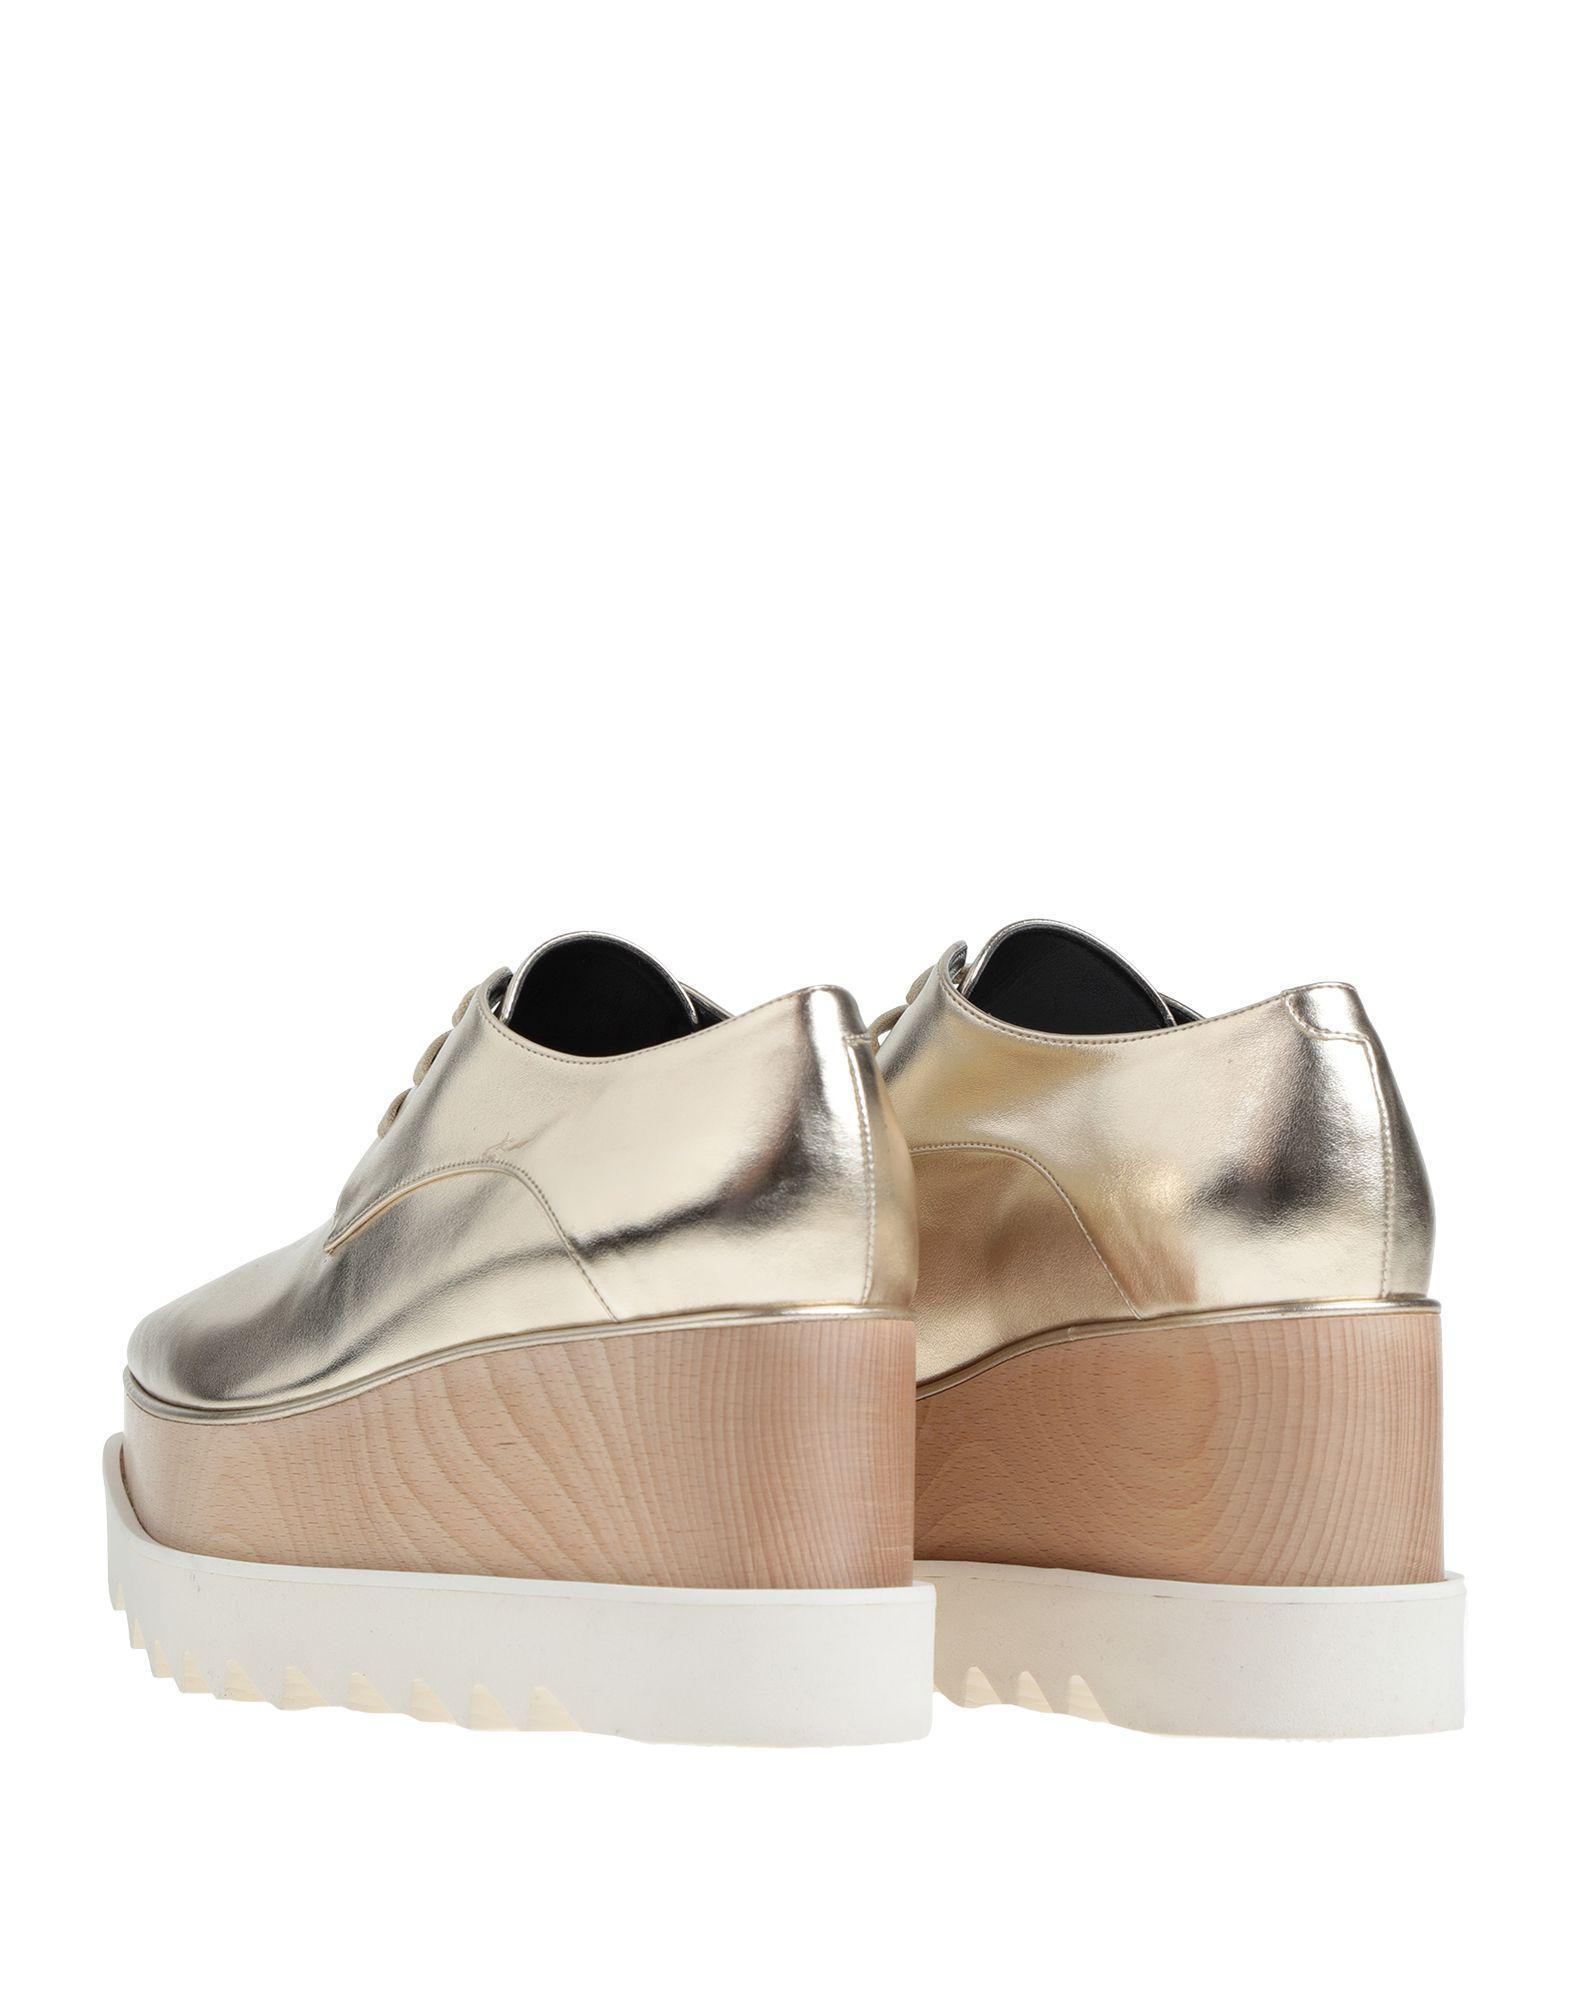 0200fe9bf902 Lyst - Stella McCartney Lace-up Shoe